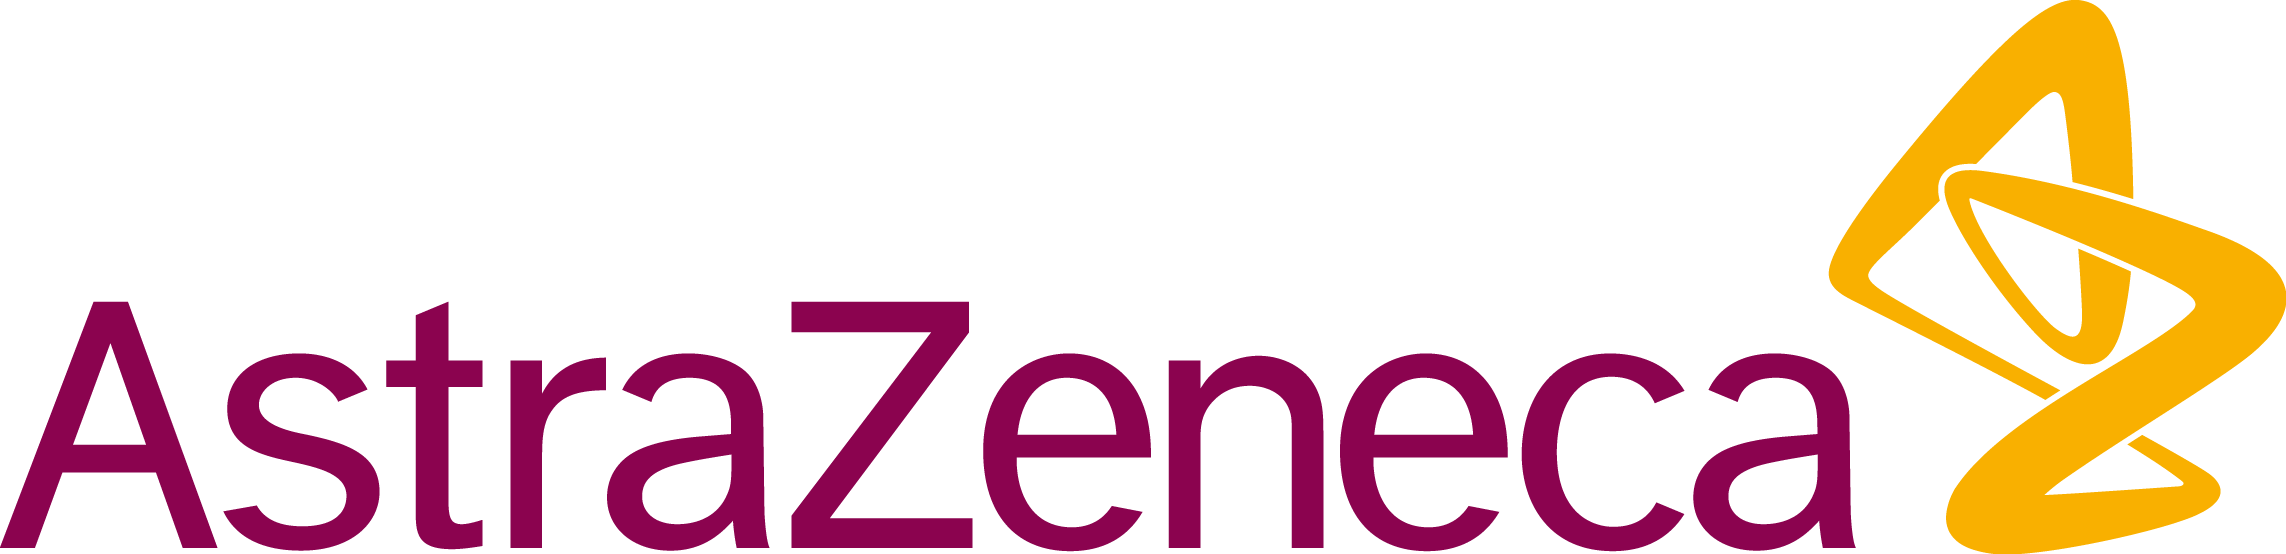 Astrazeneca Vector Png - Astrazeneca Logo Png Clipart (2286x554), Png Download